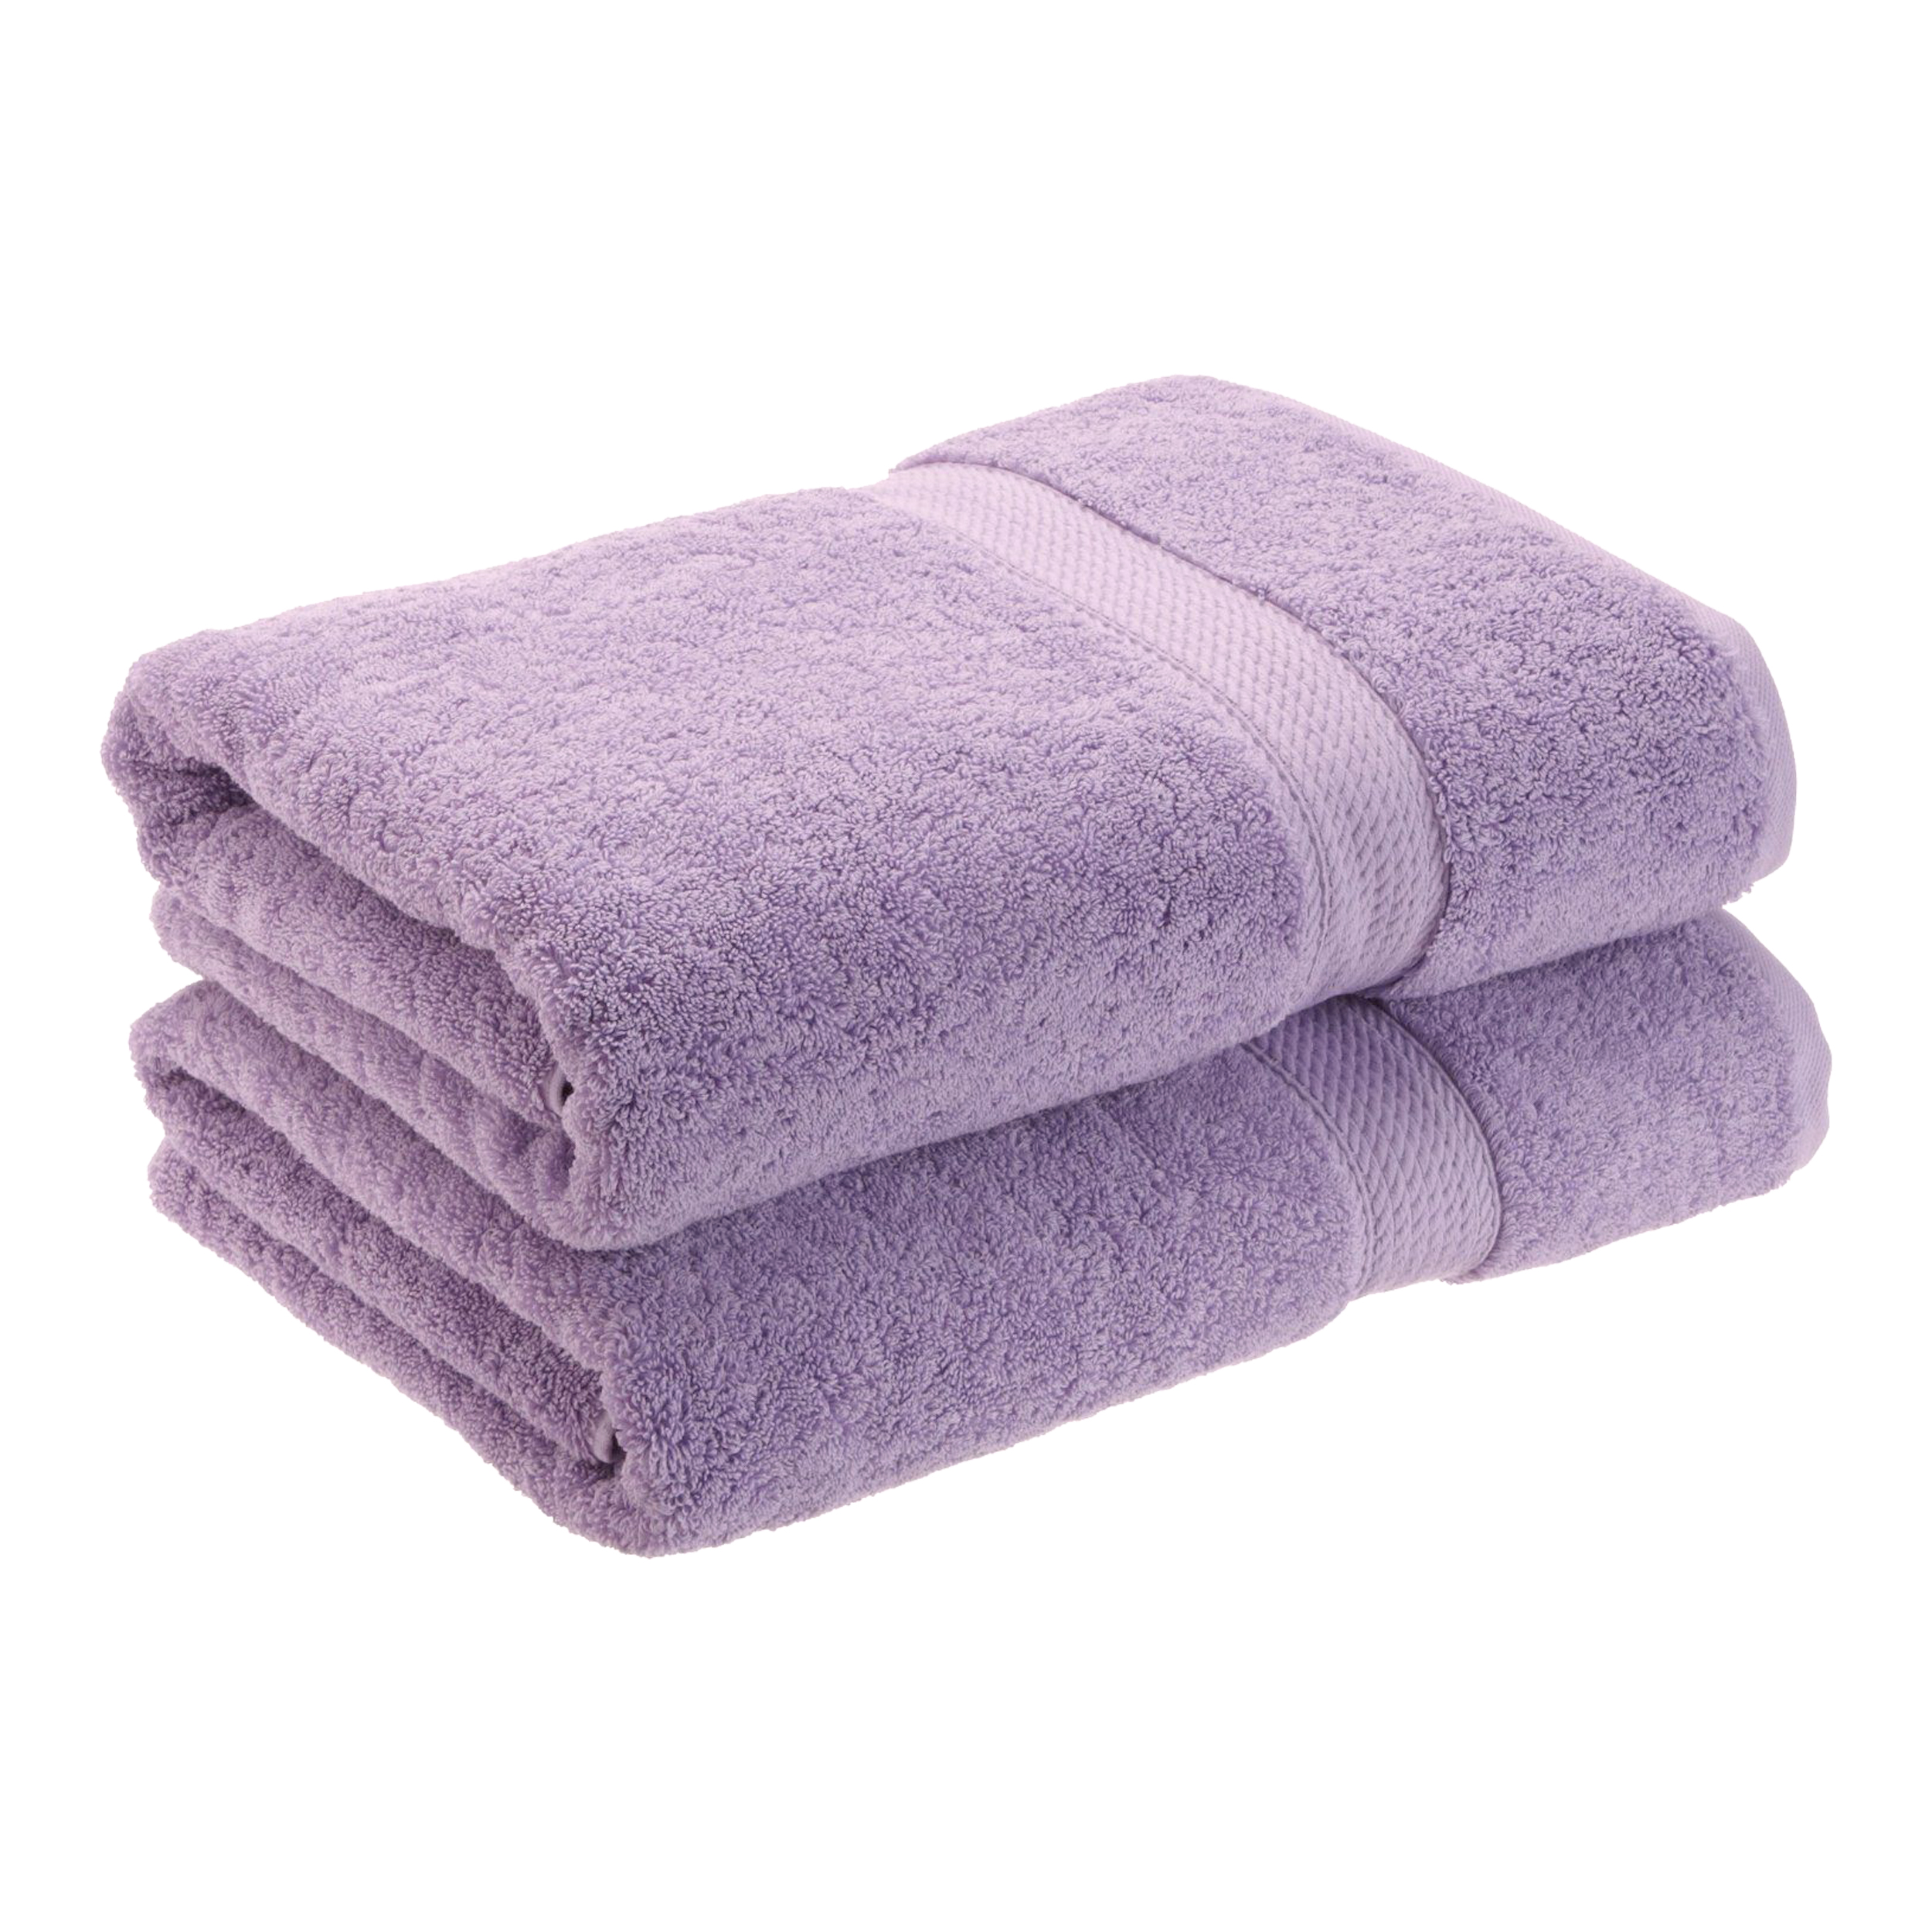 Superior 900GSM Egyptian Quality Cotton 2-Piece Bath Towel Set by Superior